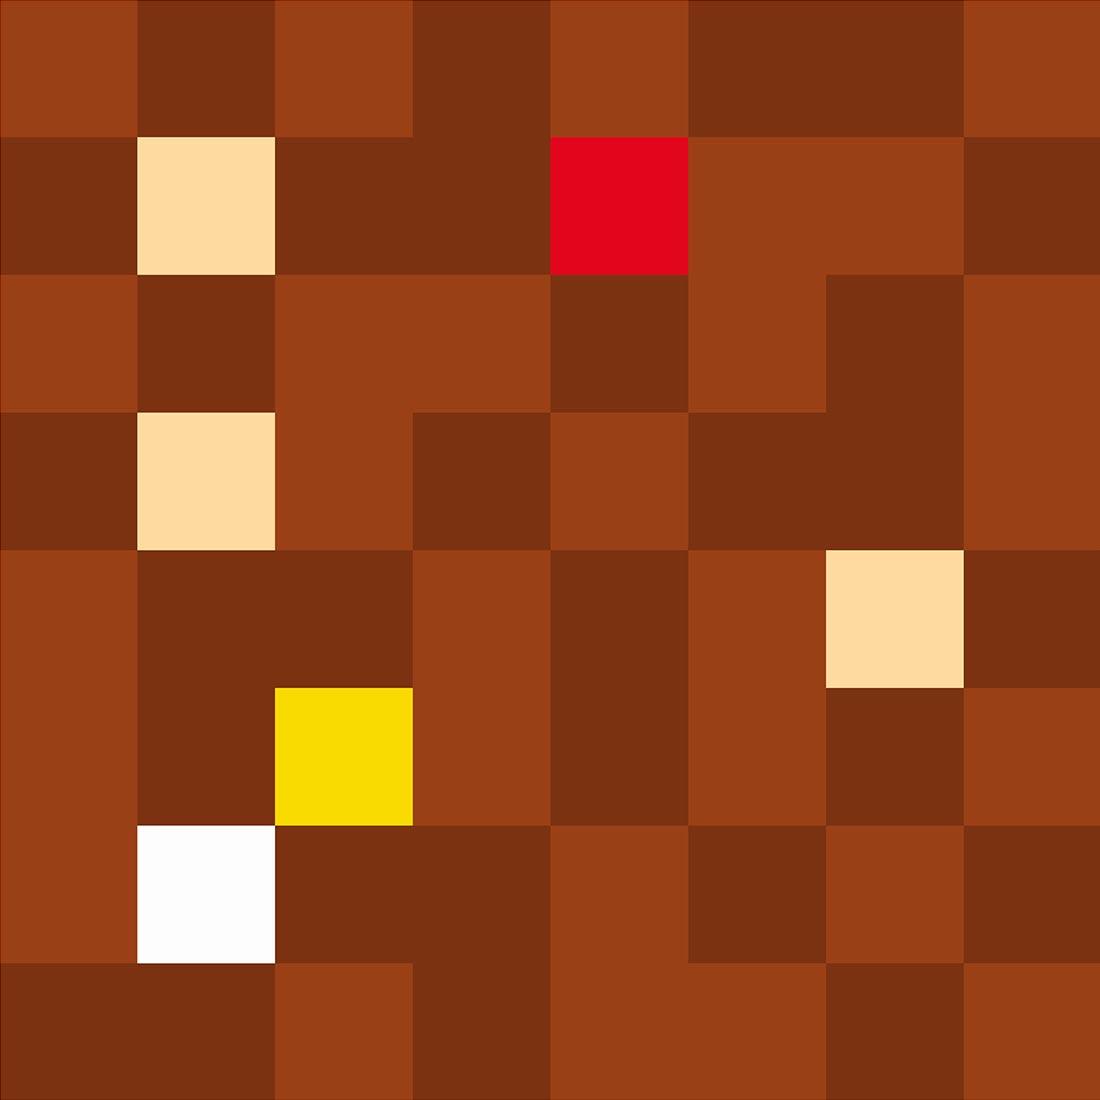 scrambled-videogame-charakters_05